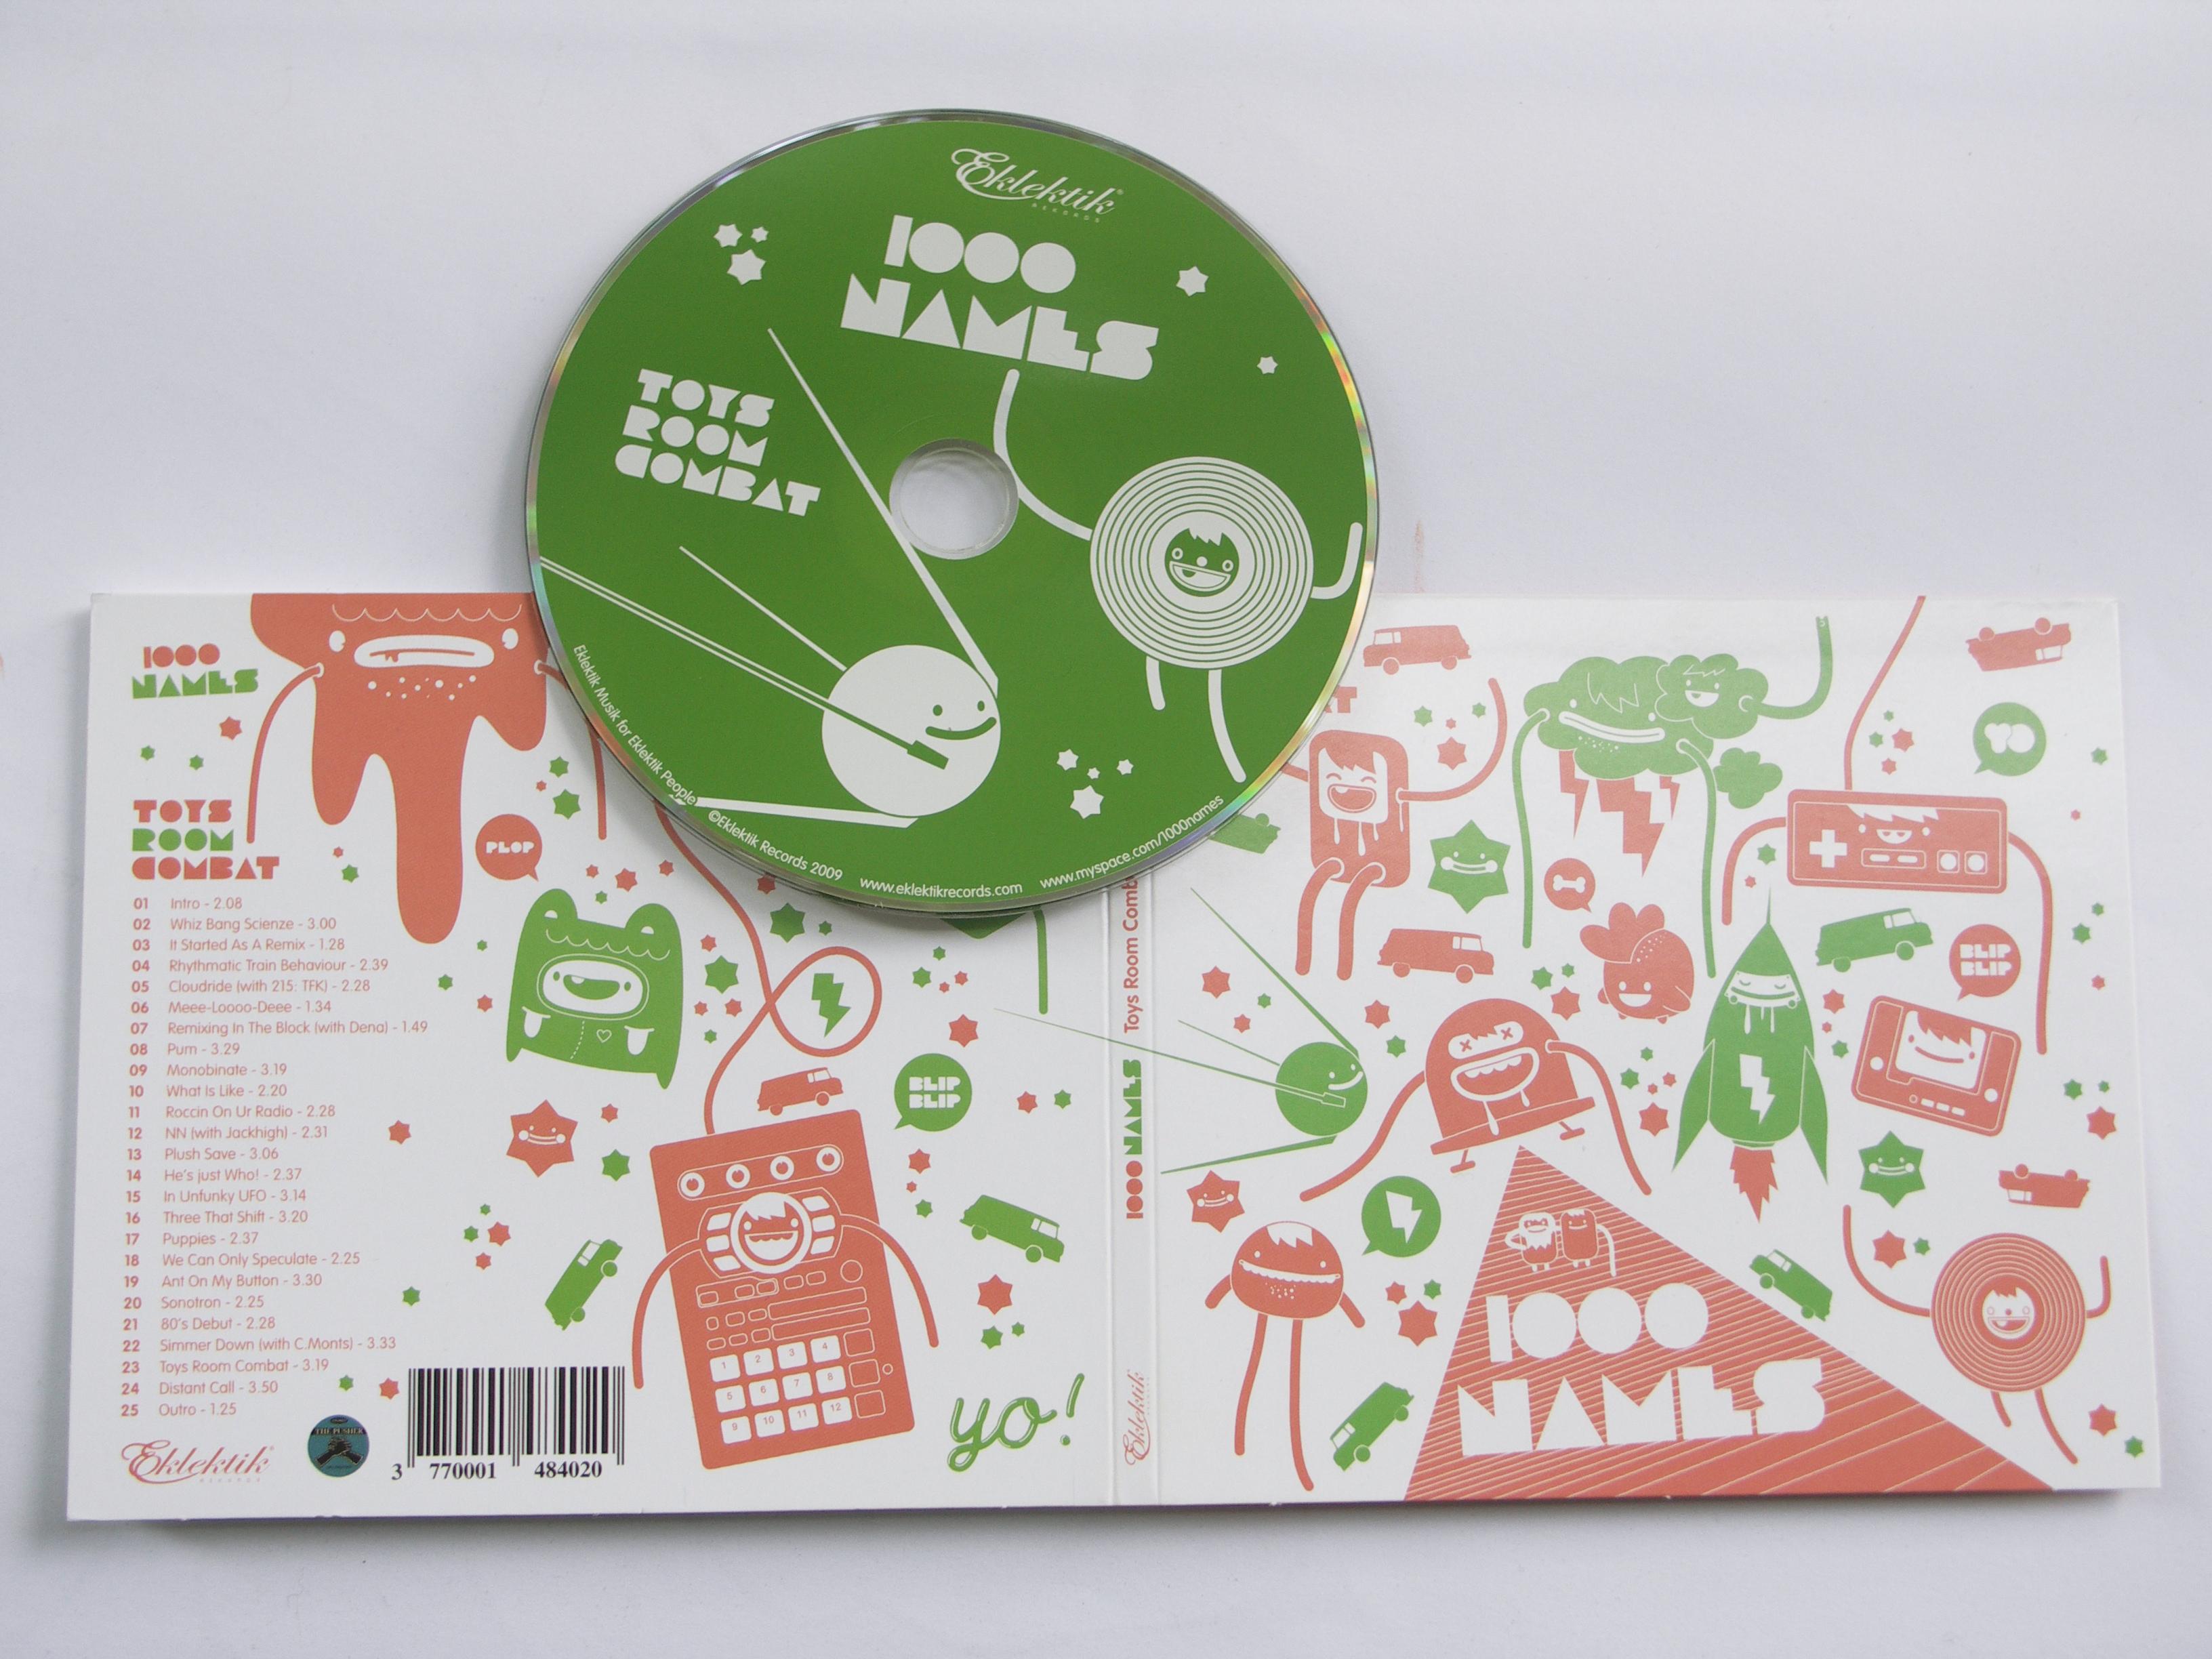 Good Wallpaper Music Kawaii - urban-music-records-Berlin-cute-ART-monster-illustration-Toy-happy-design-arte-Sofia-sweet-box-cd-character-yo-style-tshirt-doodle-Bulgaria-cover-kawaii-customized-jabba-electronica-doodles-sat-custom-disc-Blitz-vectors-diseno-vector-desenho-ilustracion-doodling-personagem-vetor-Thunderbolt-disque-ilustracao-vektor-vetores-digipack-chomba-stickathing-eklektik-1000names-tschomba-971808  Snapshot_905960.jpg